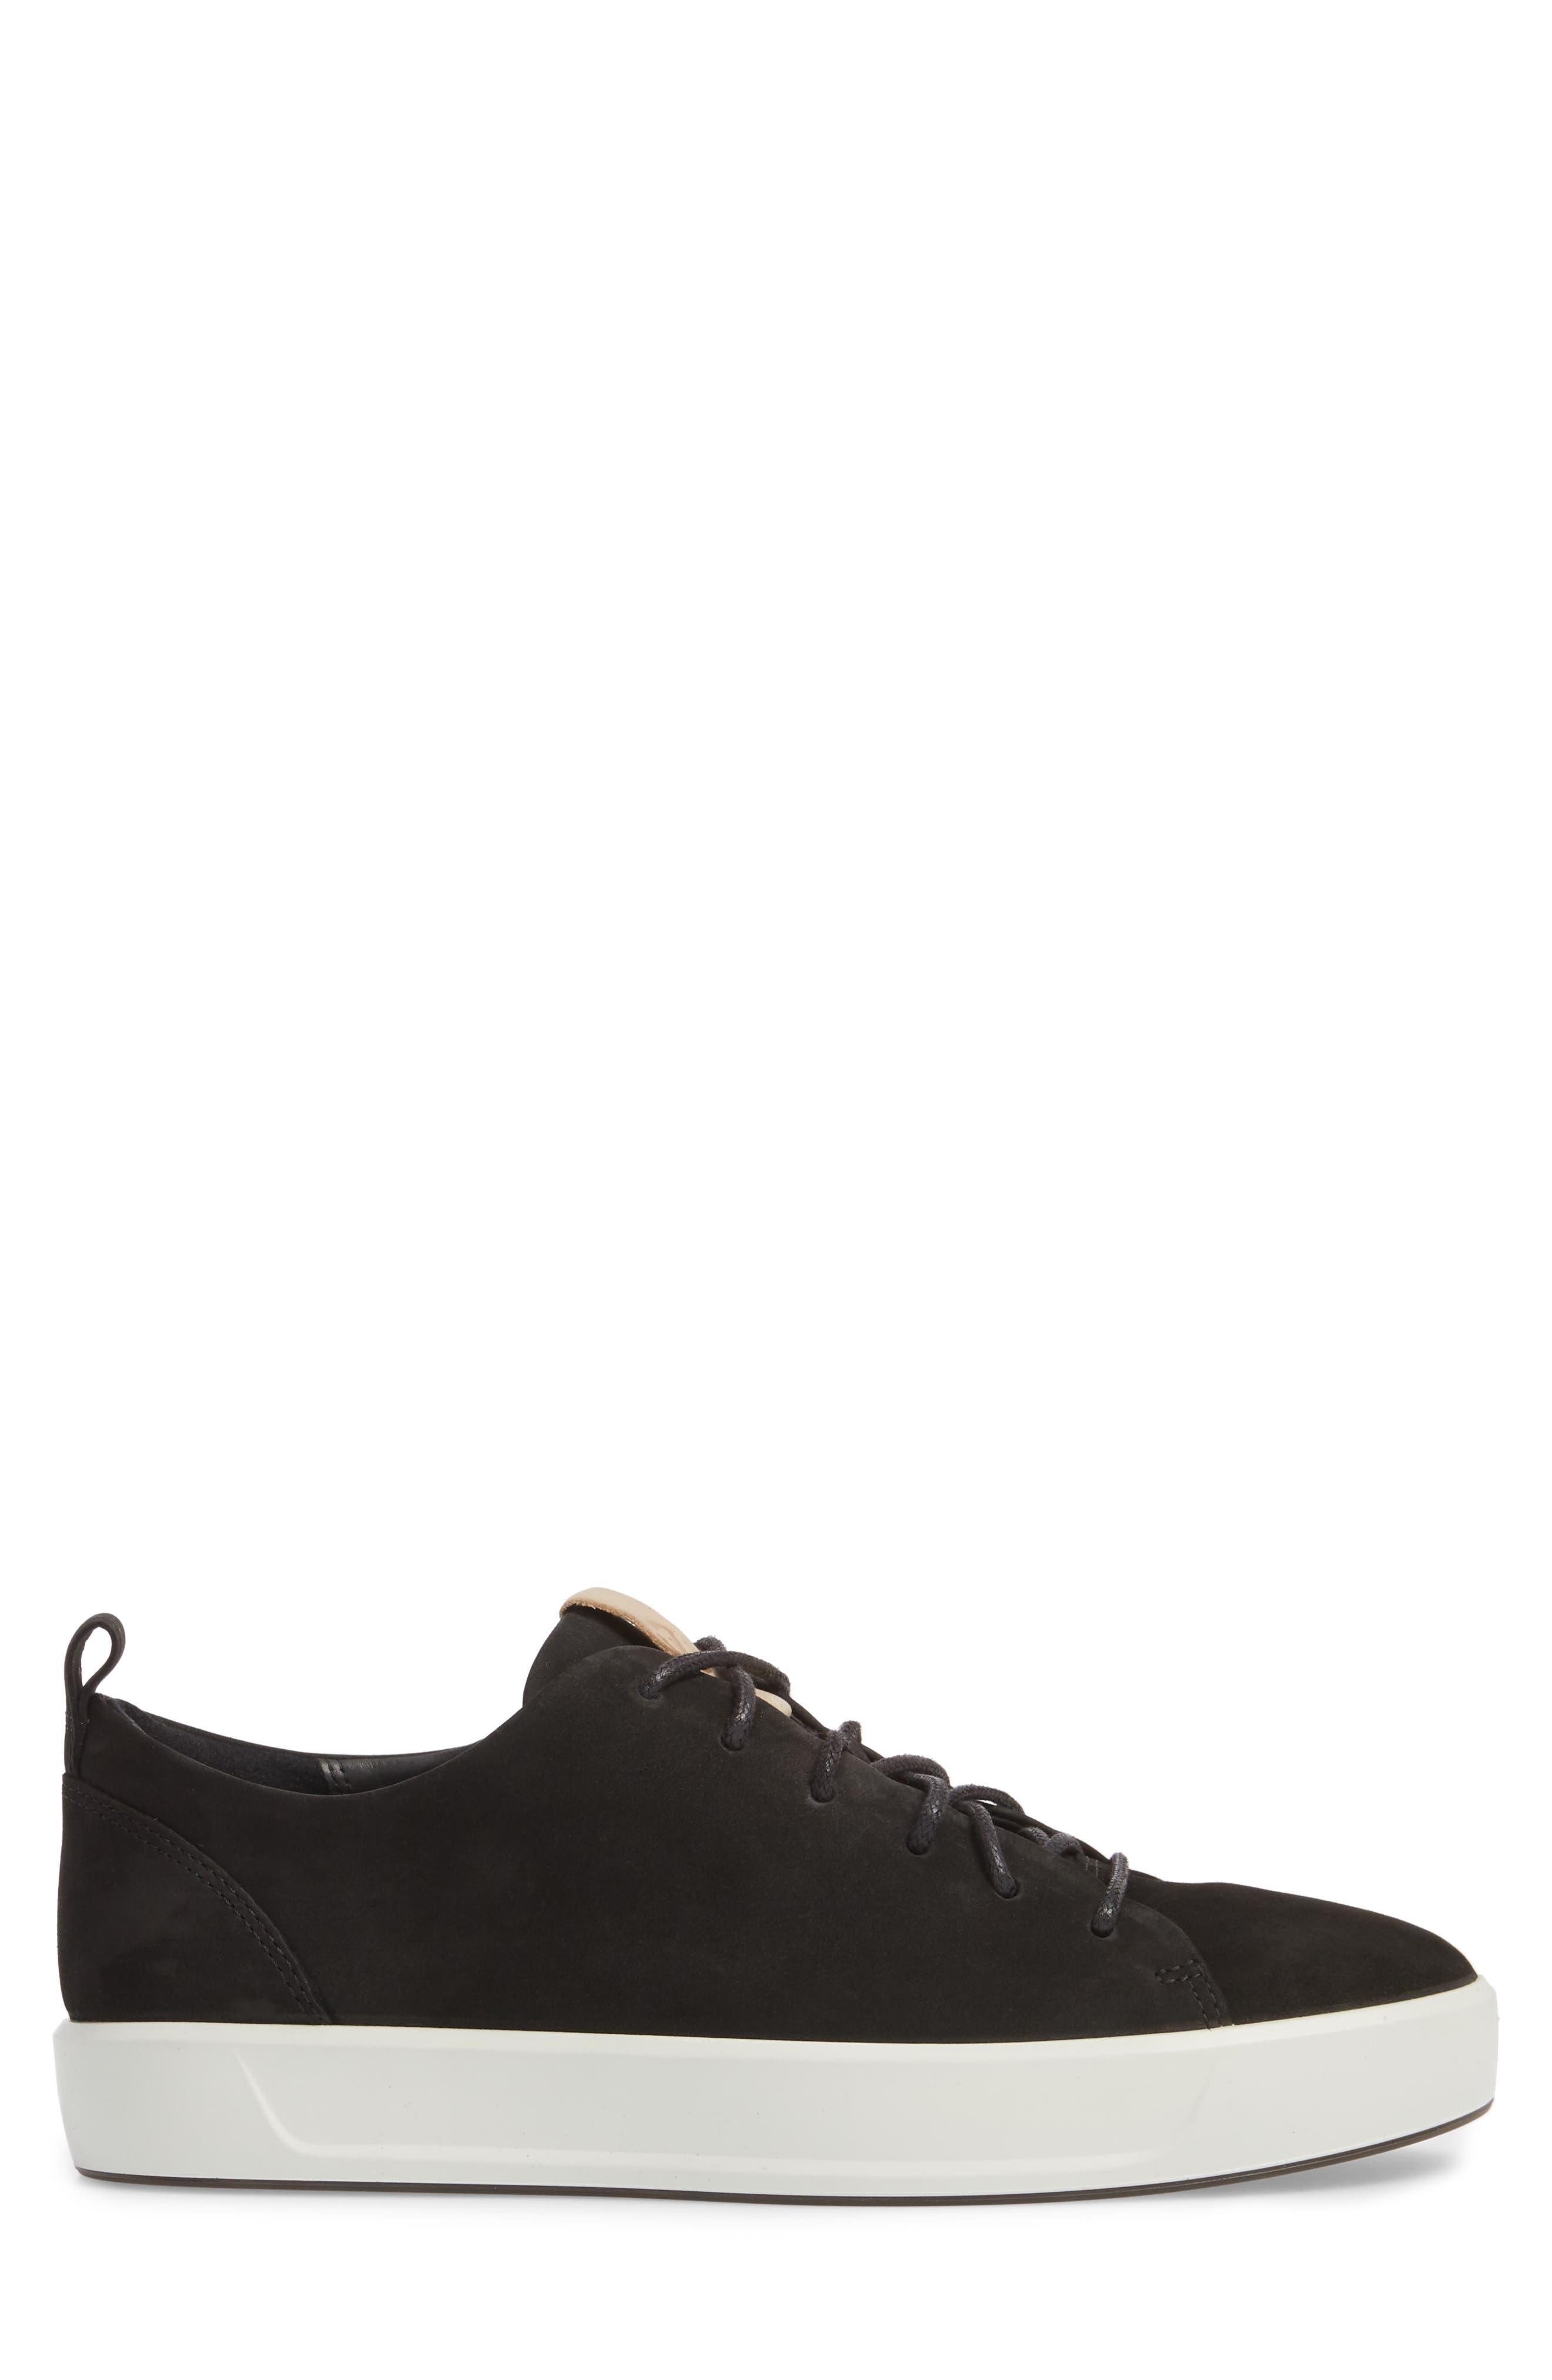 Soft 8 Sneaker,                             Alternate thumbnail 3, color,                             BLACK POWDER LEATHER